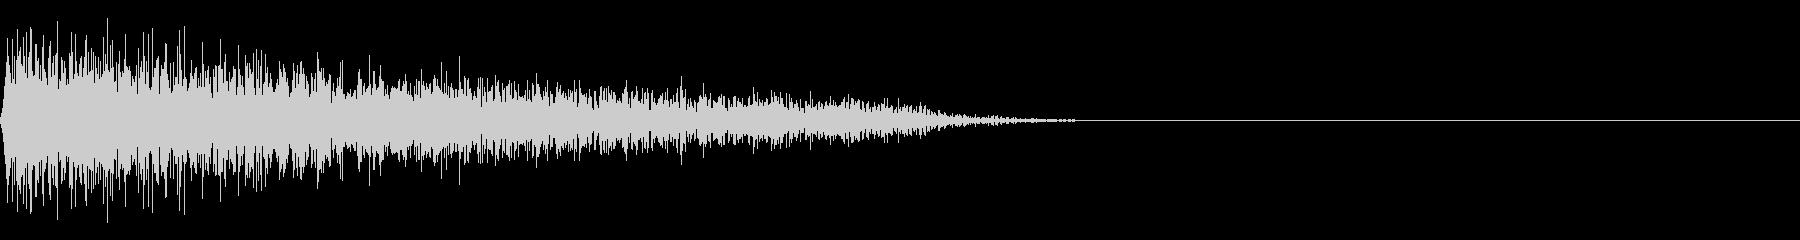 FX・SEピアノ/ショック/衝撃/1-Cの未再生の波形